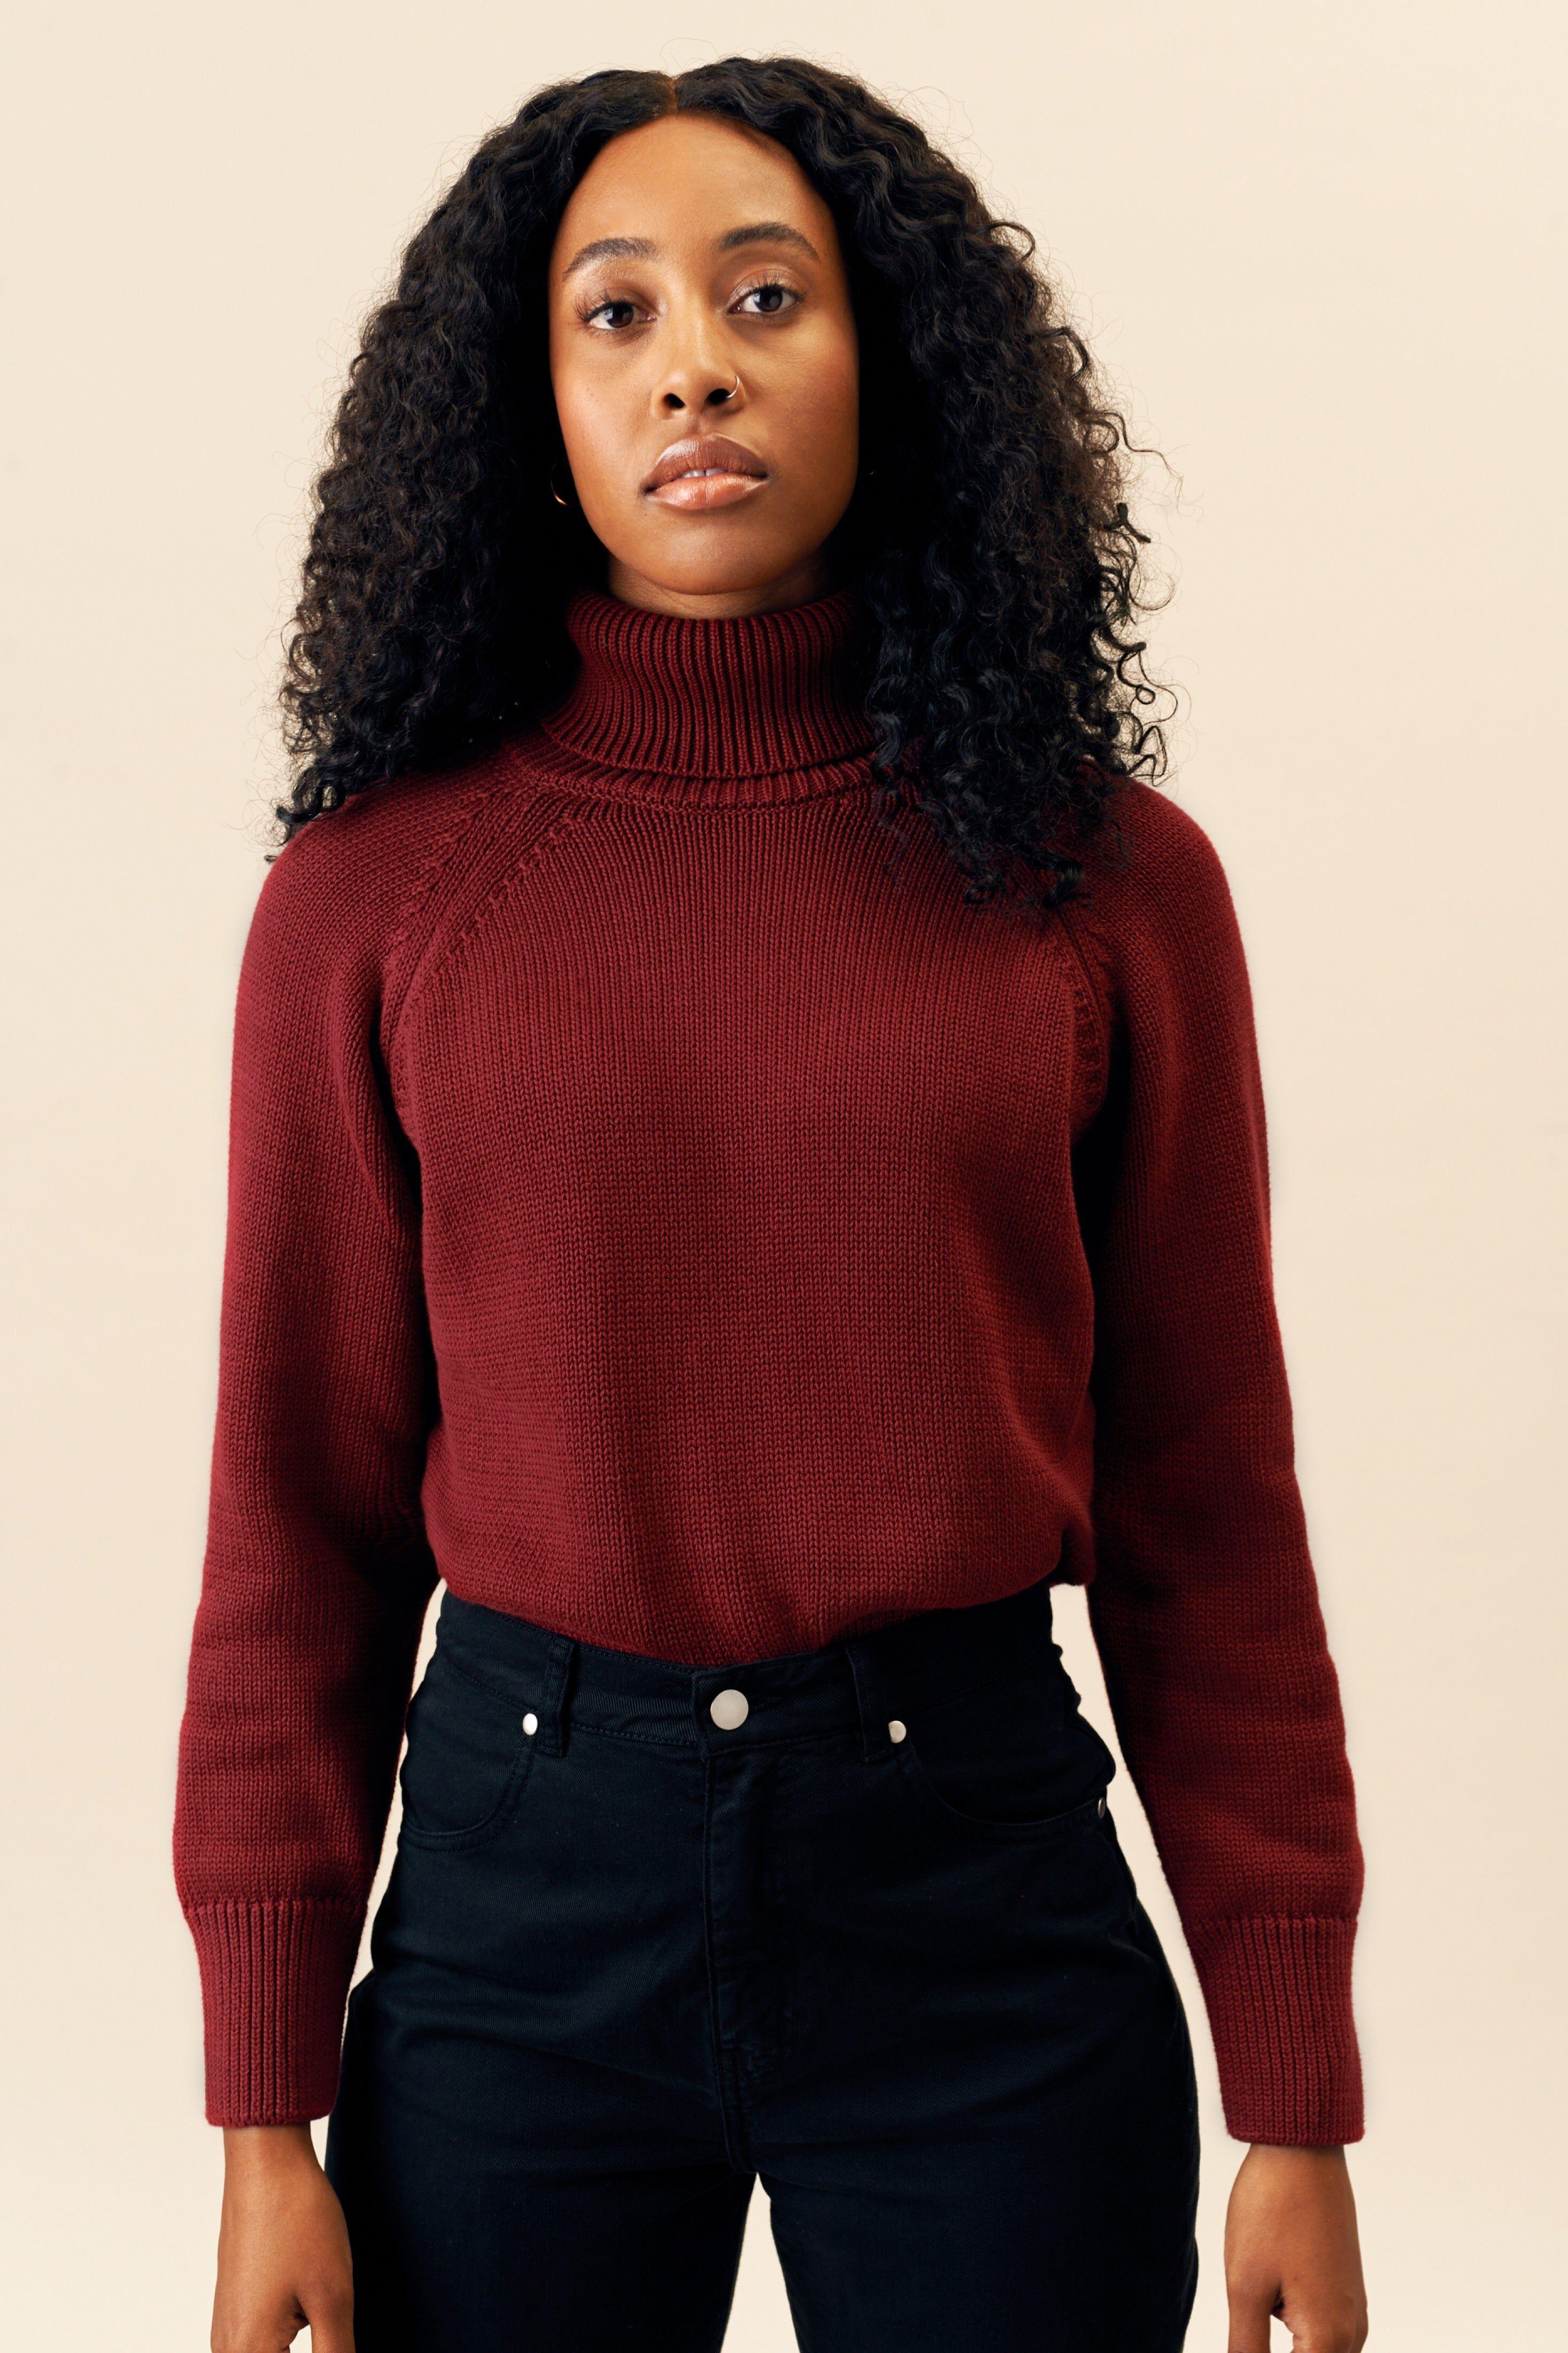 Kotn Women's Turtleneck Top Sweater in Merlot Red, Size 2XL